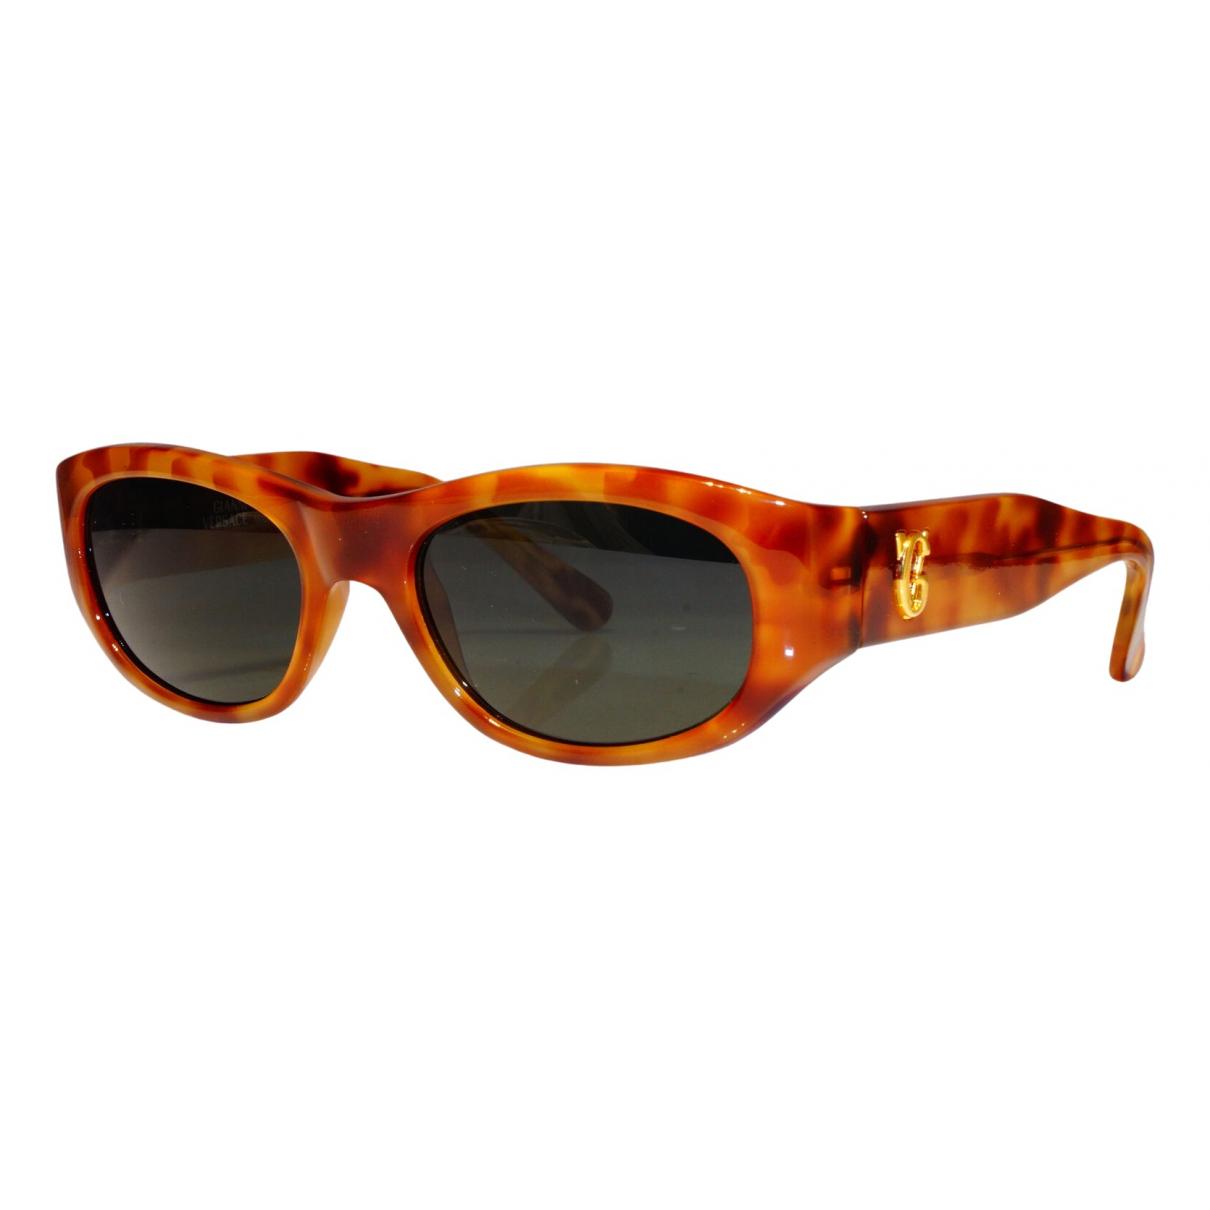 Gianni Versace \N Burgundy Sunglasses for Men \N